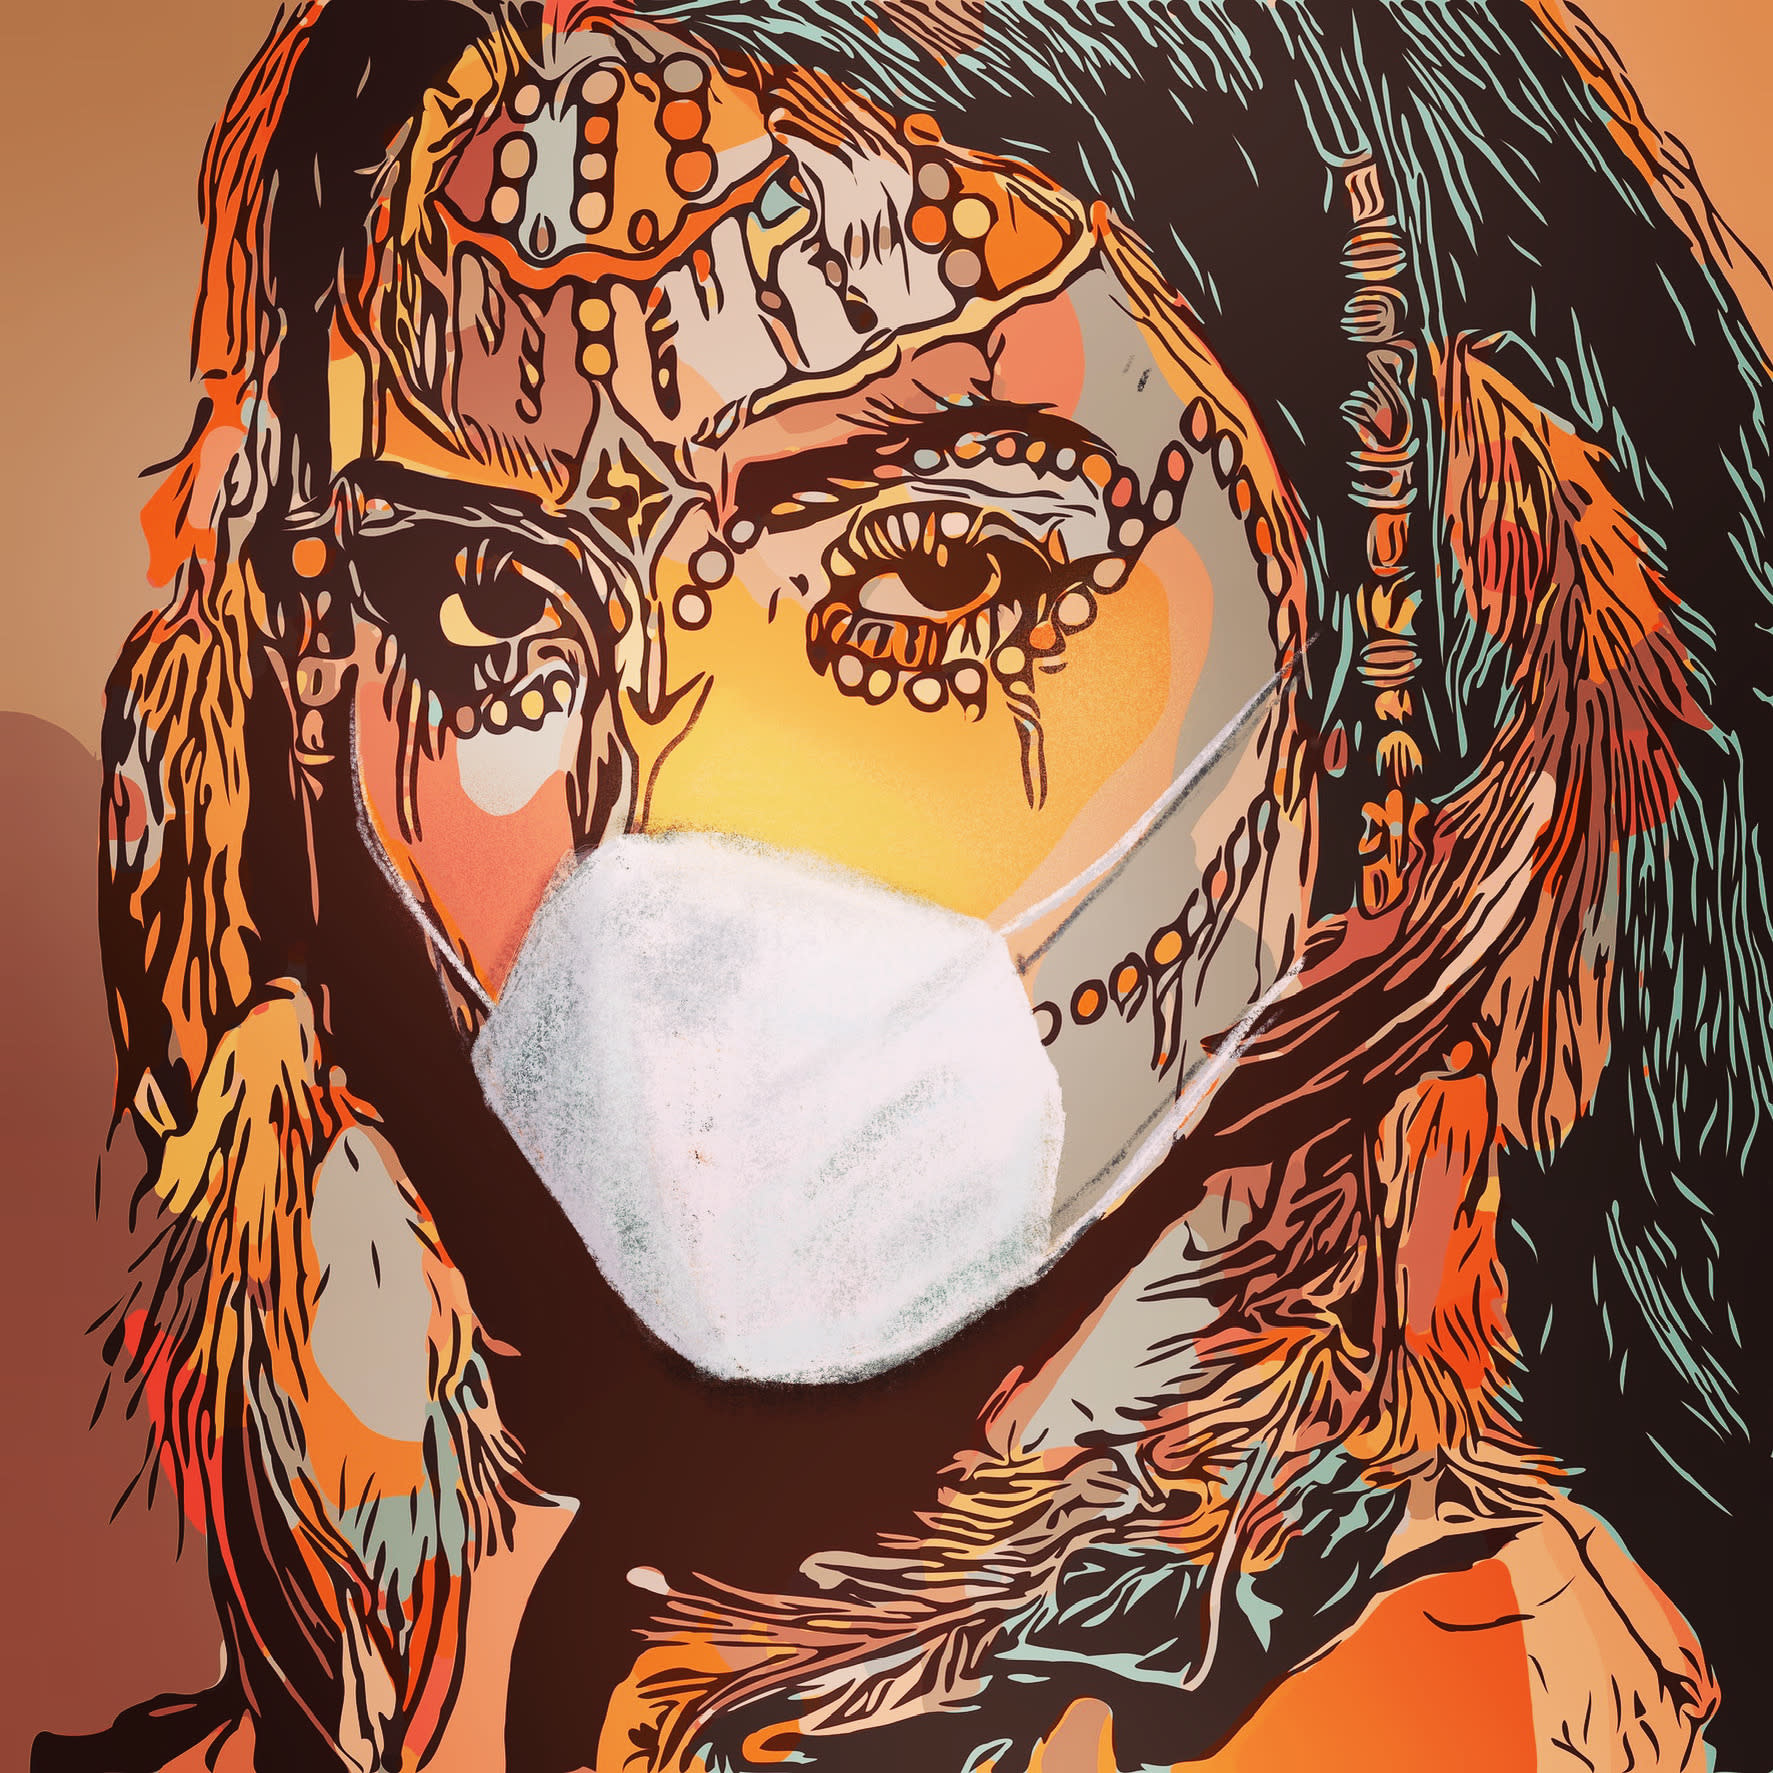 Juan ro corona tribus 50 x 70 digital afgzuc